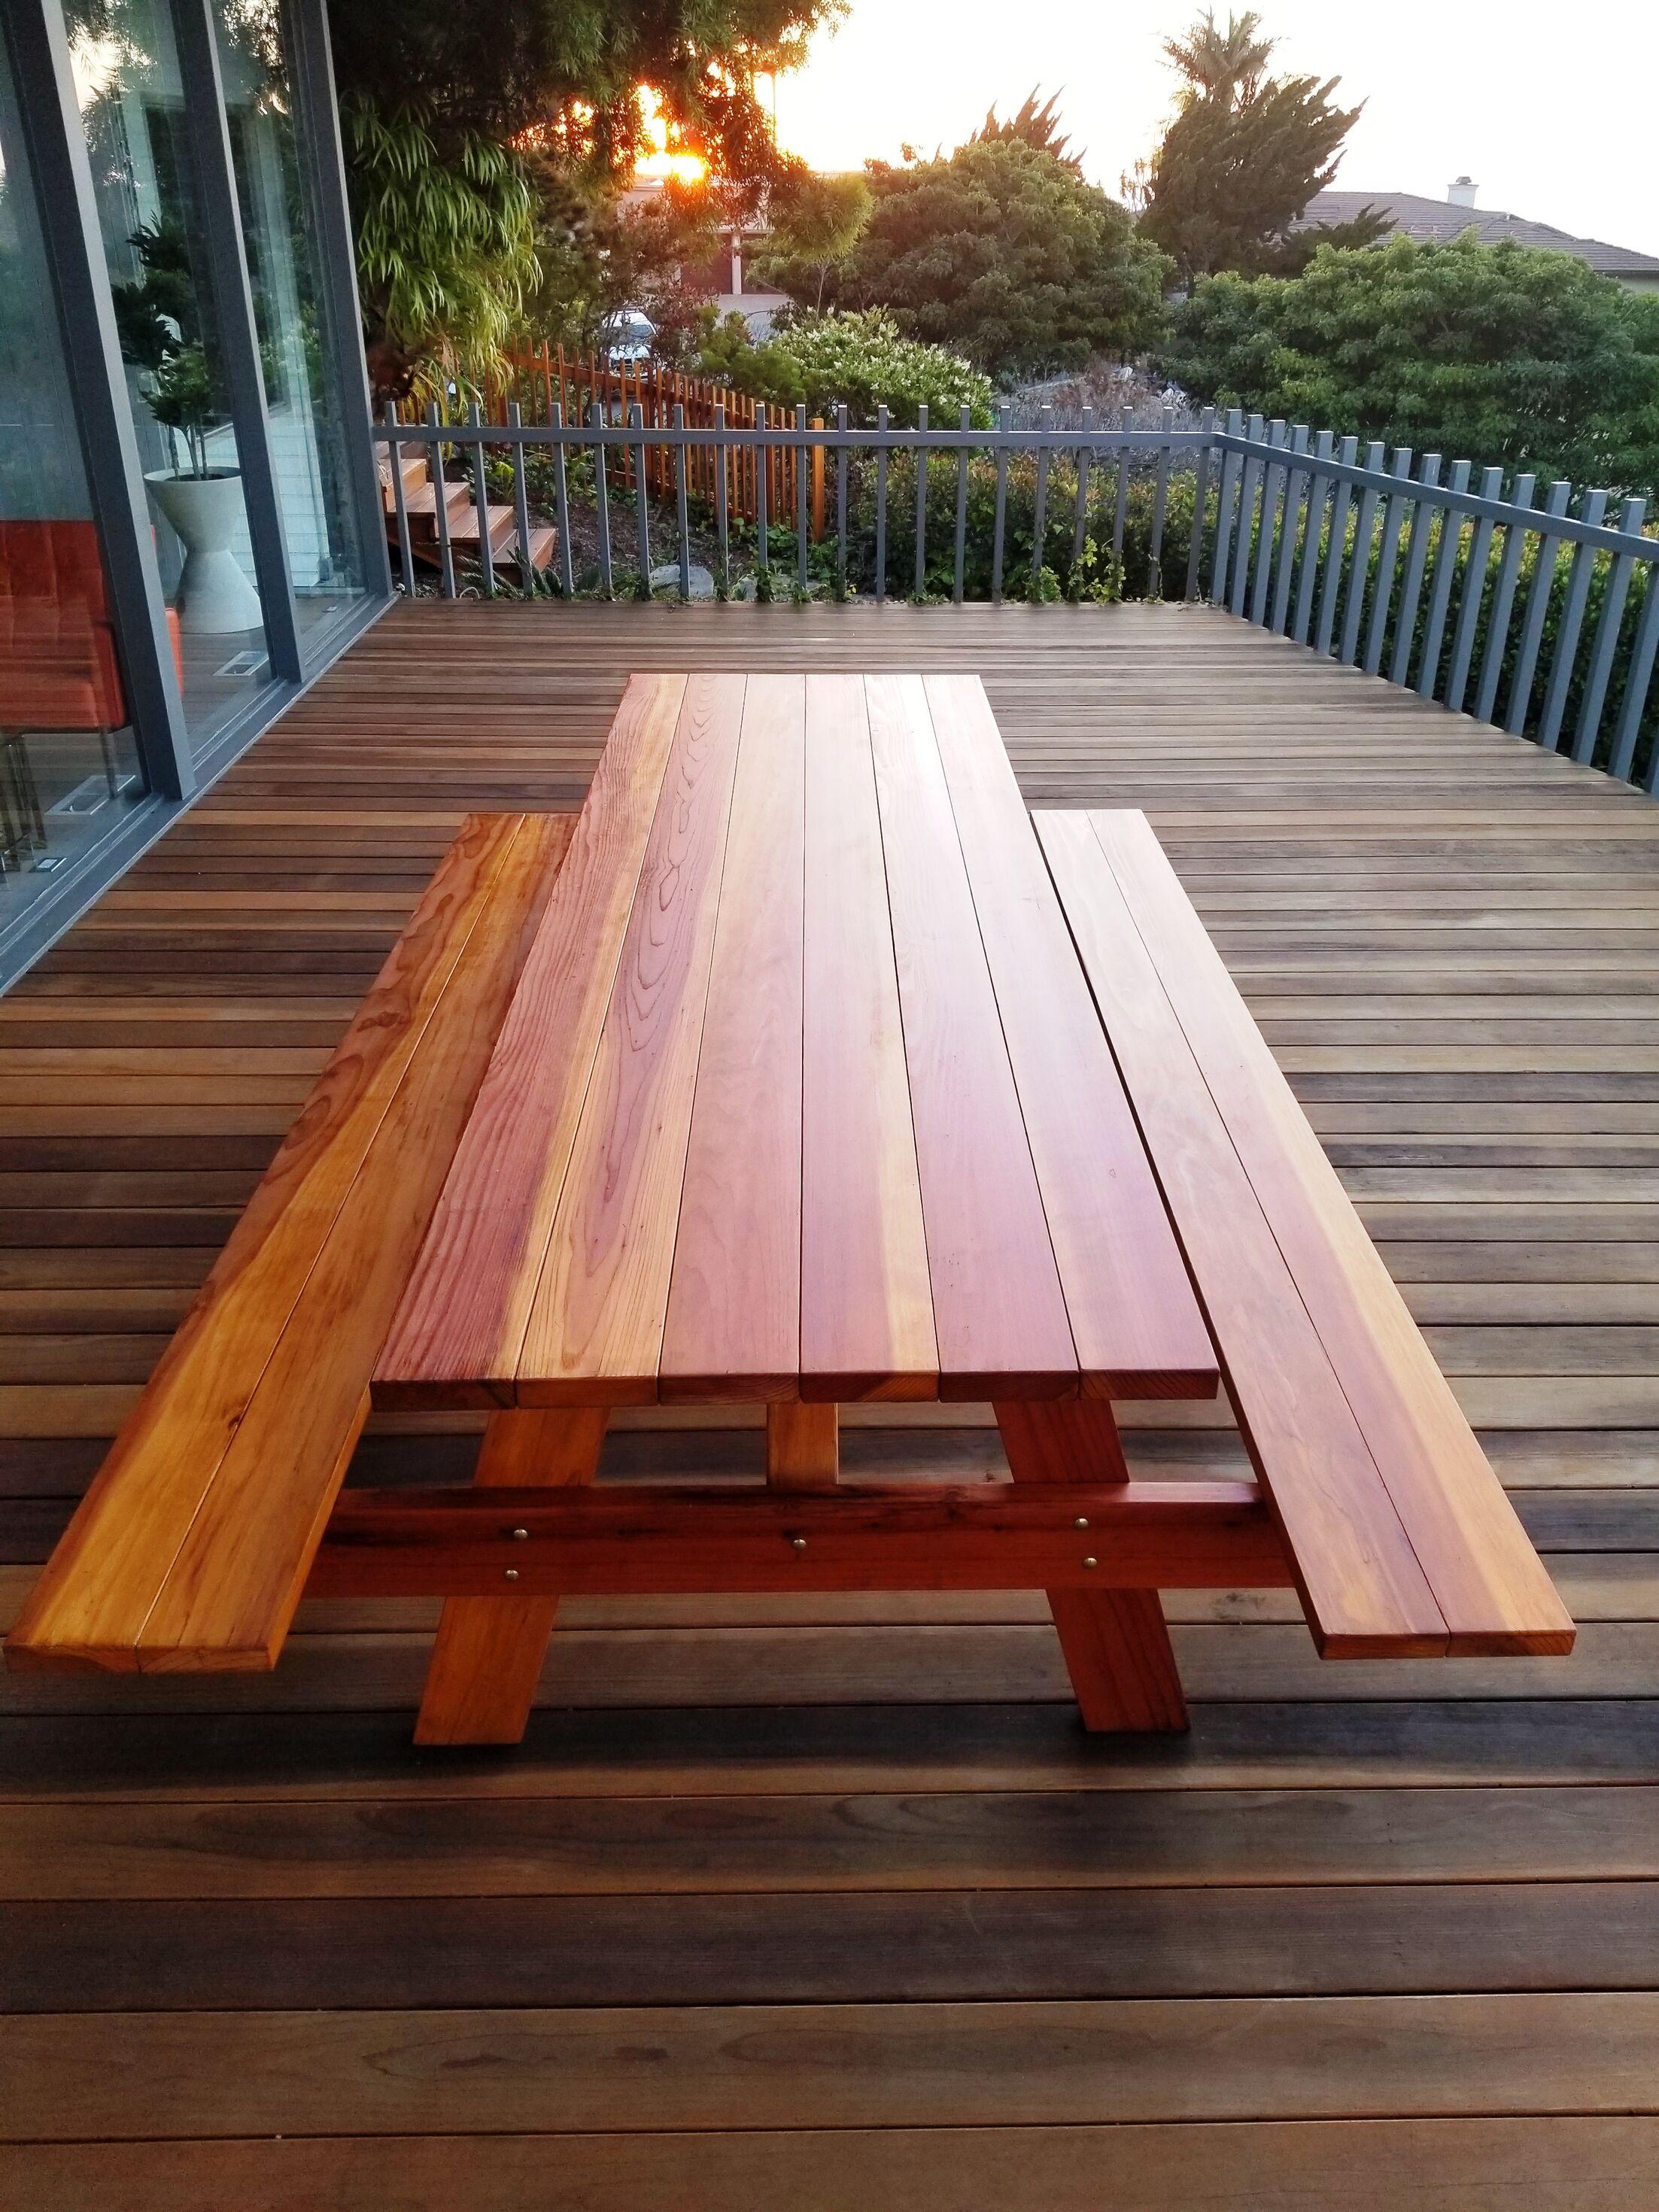 Threadgill Wooden Picnic Table Color: Super Deck, Size: 72